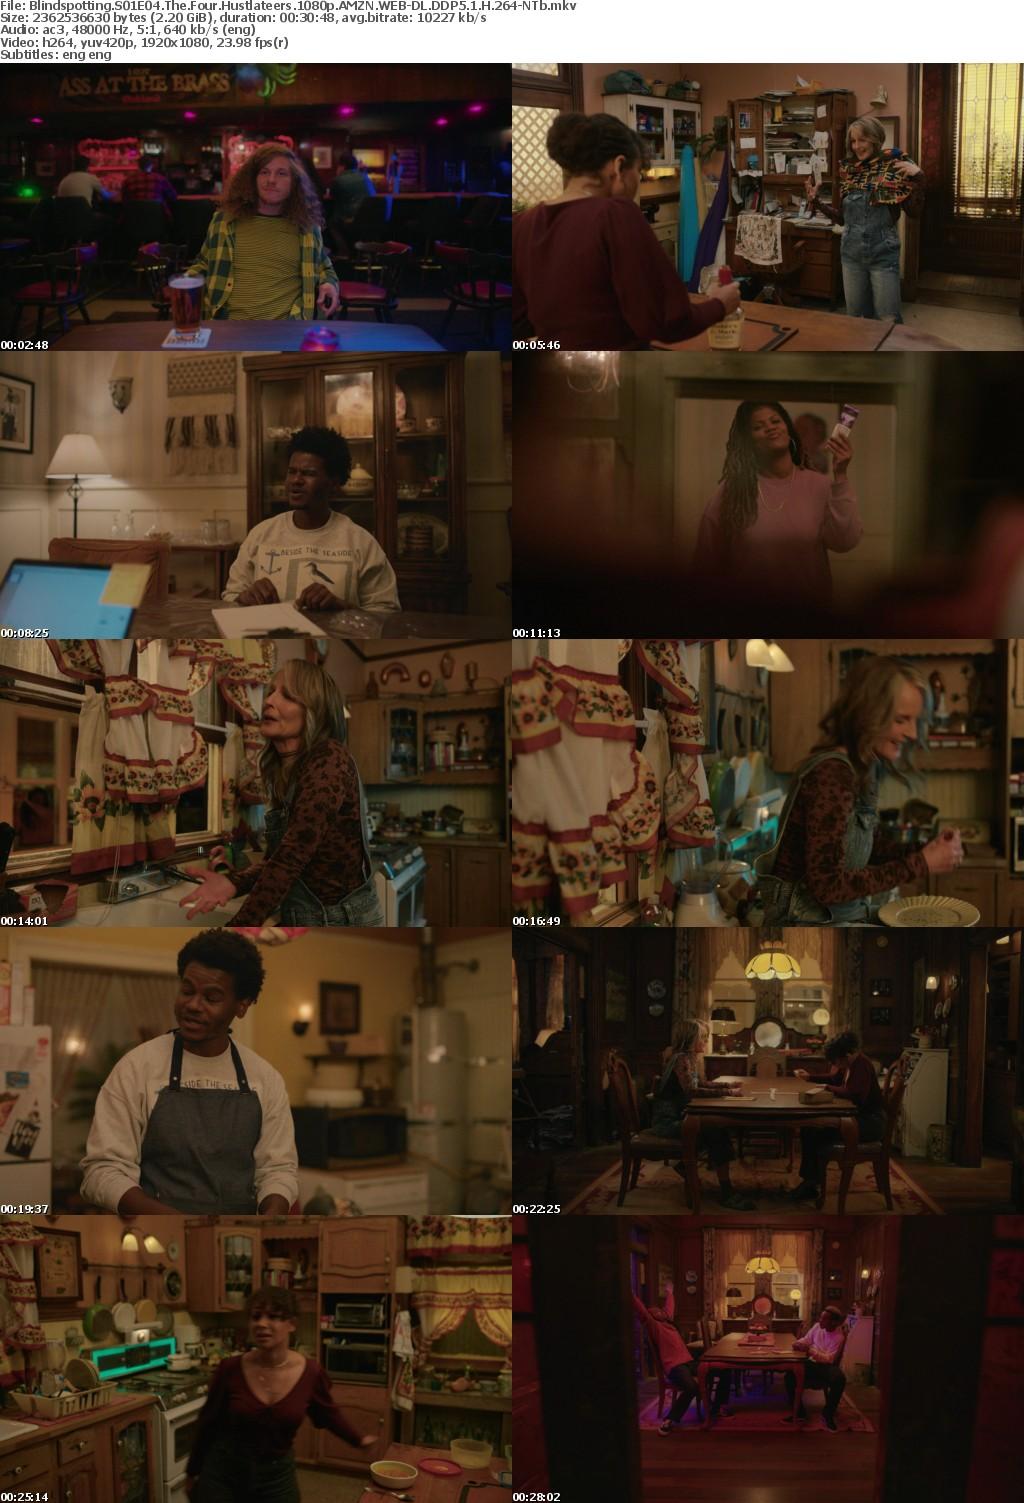 Blindspotting S01E04 The Four Hustlateers 1080p AMZN WEBRip DDP5 1 x264-NTb